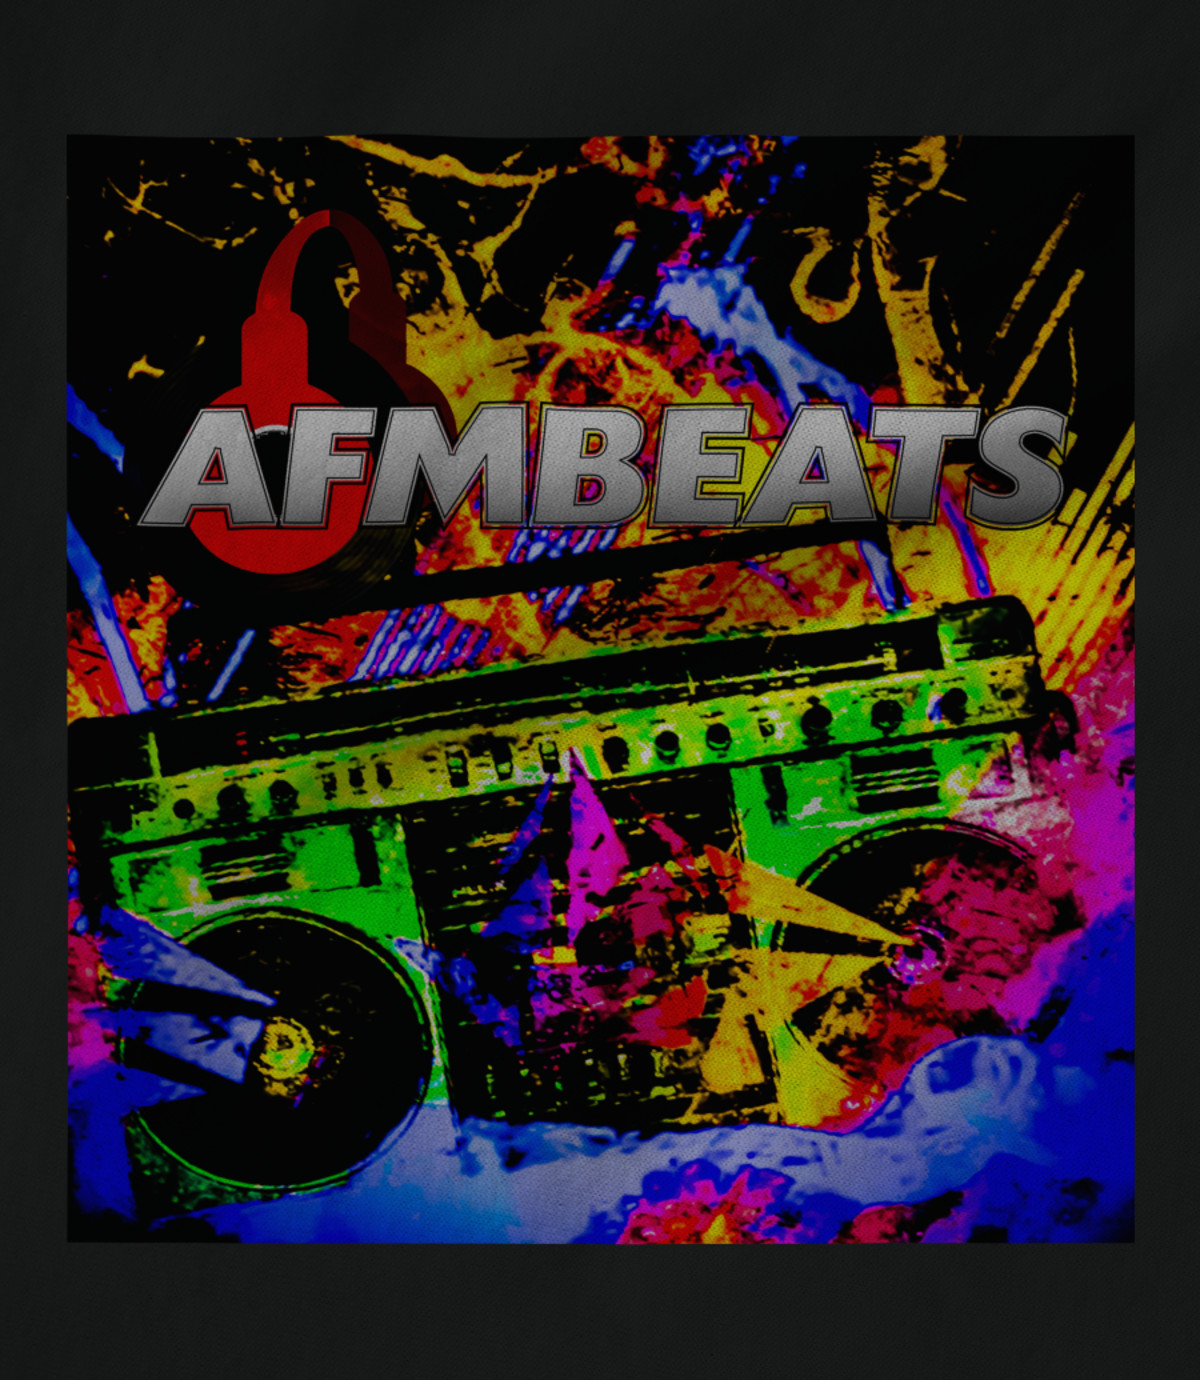 Afmbeats afmbeats logo hoodie 1512385098